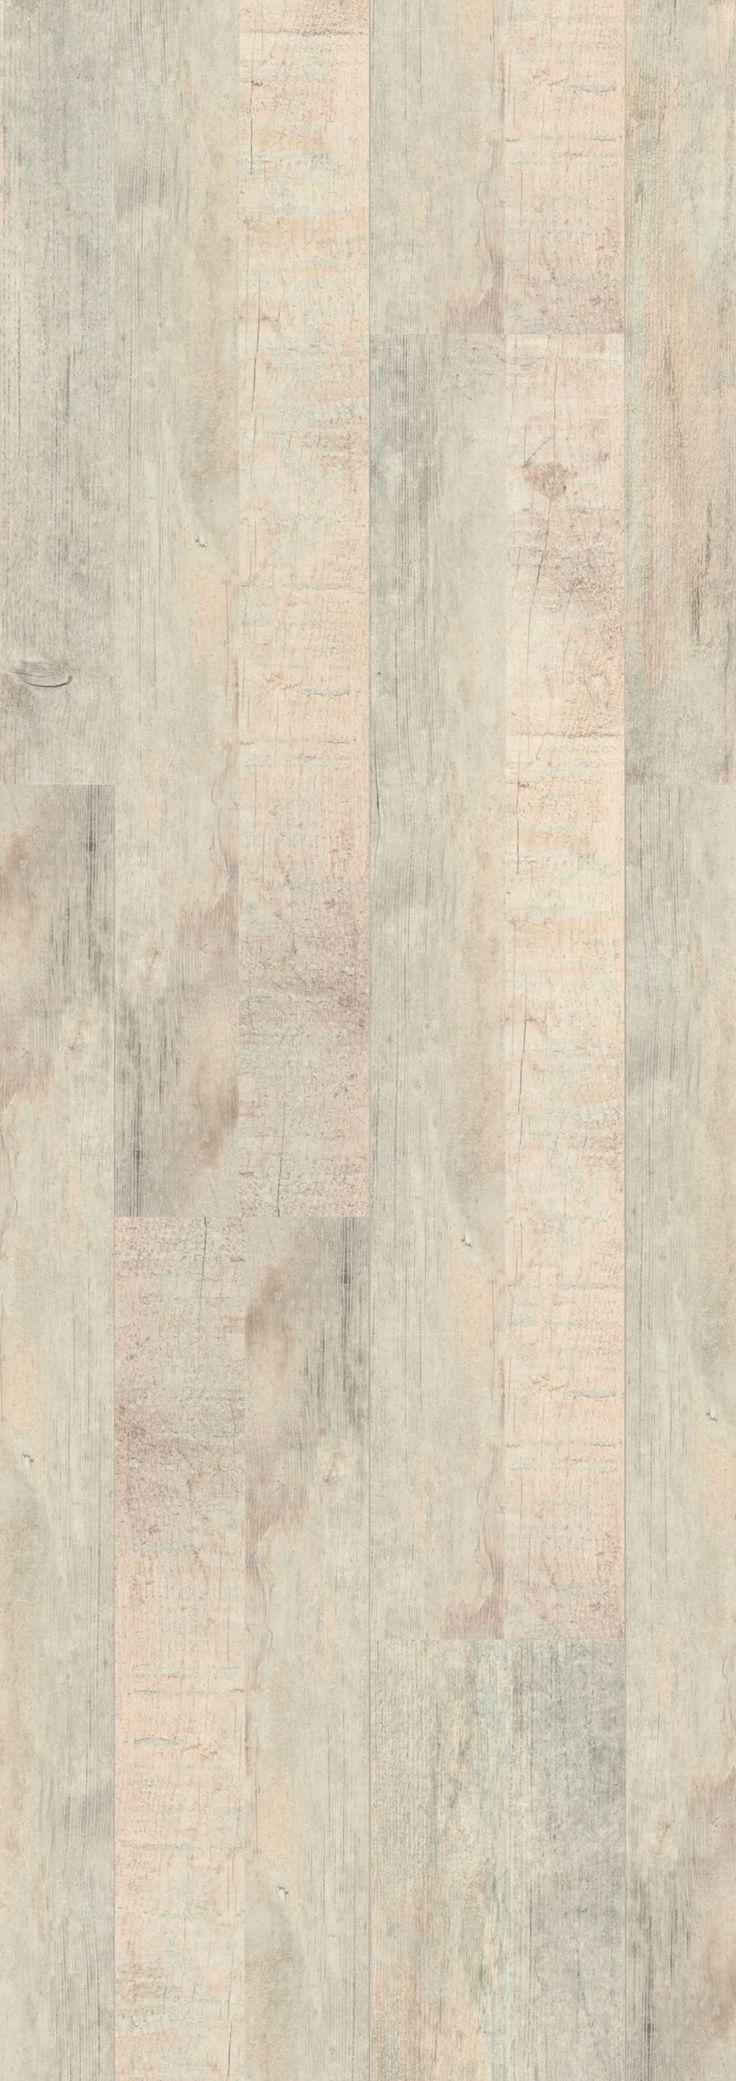 Flooring_에코노_(우드/180각) DEW2708-A2